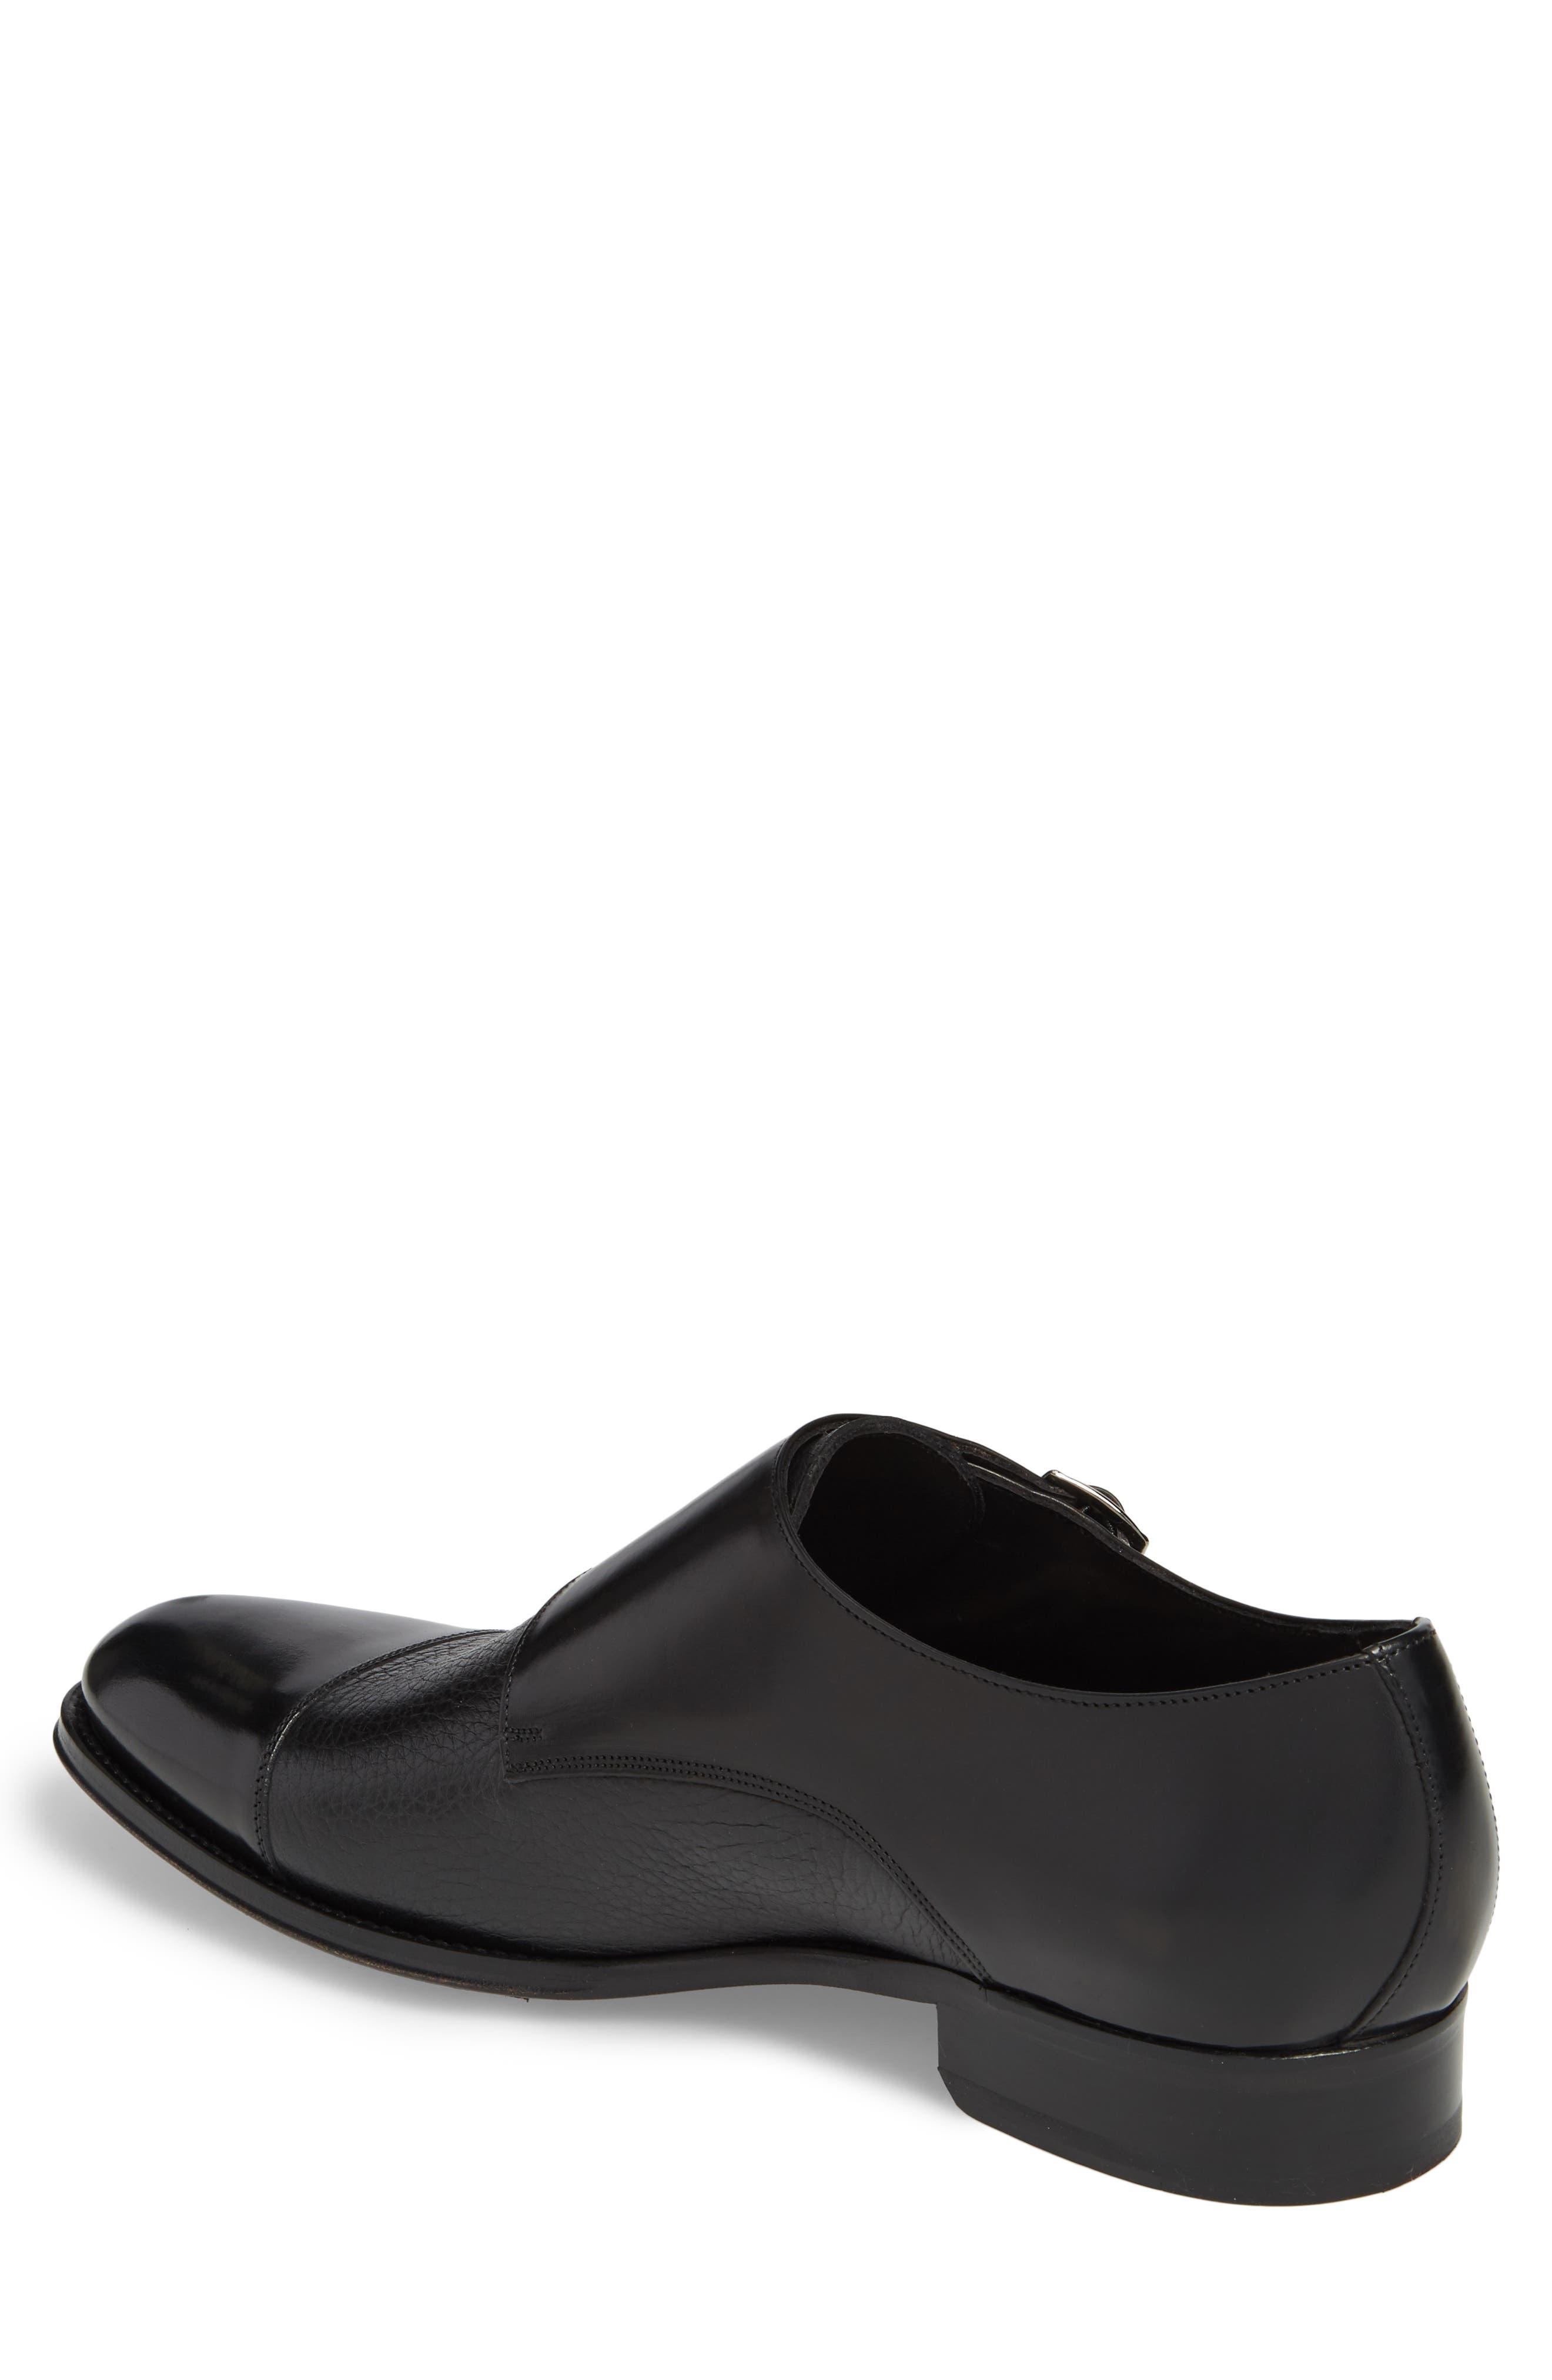 Kiev Double Monk Strap Shoe,                             Alternate thumbnail 2, color,                             BLACK/ BLACK LEATHER